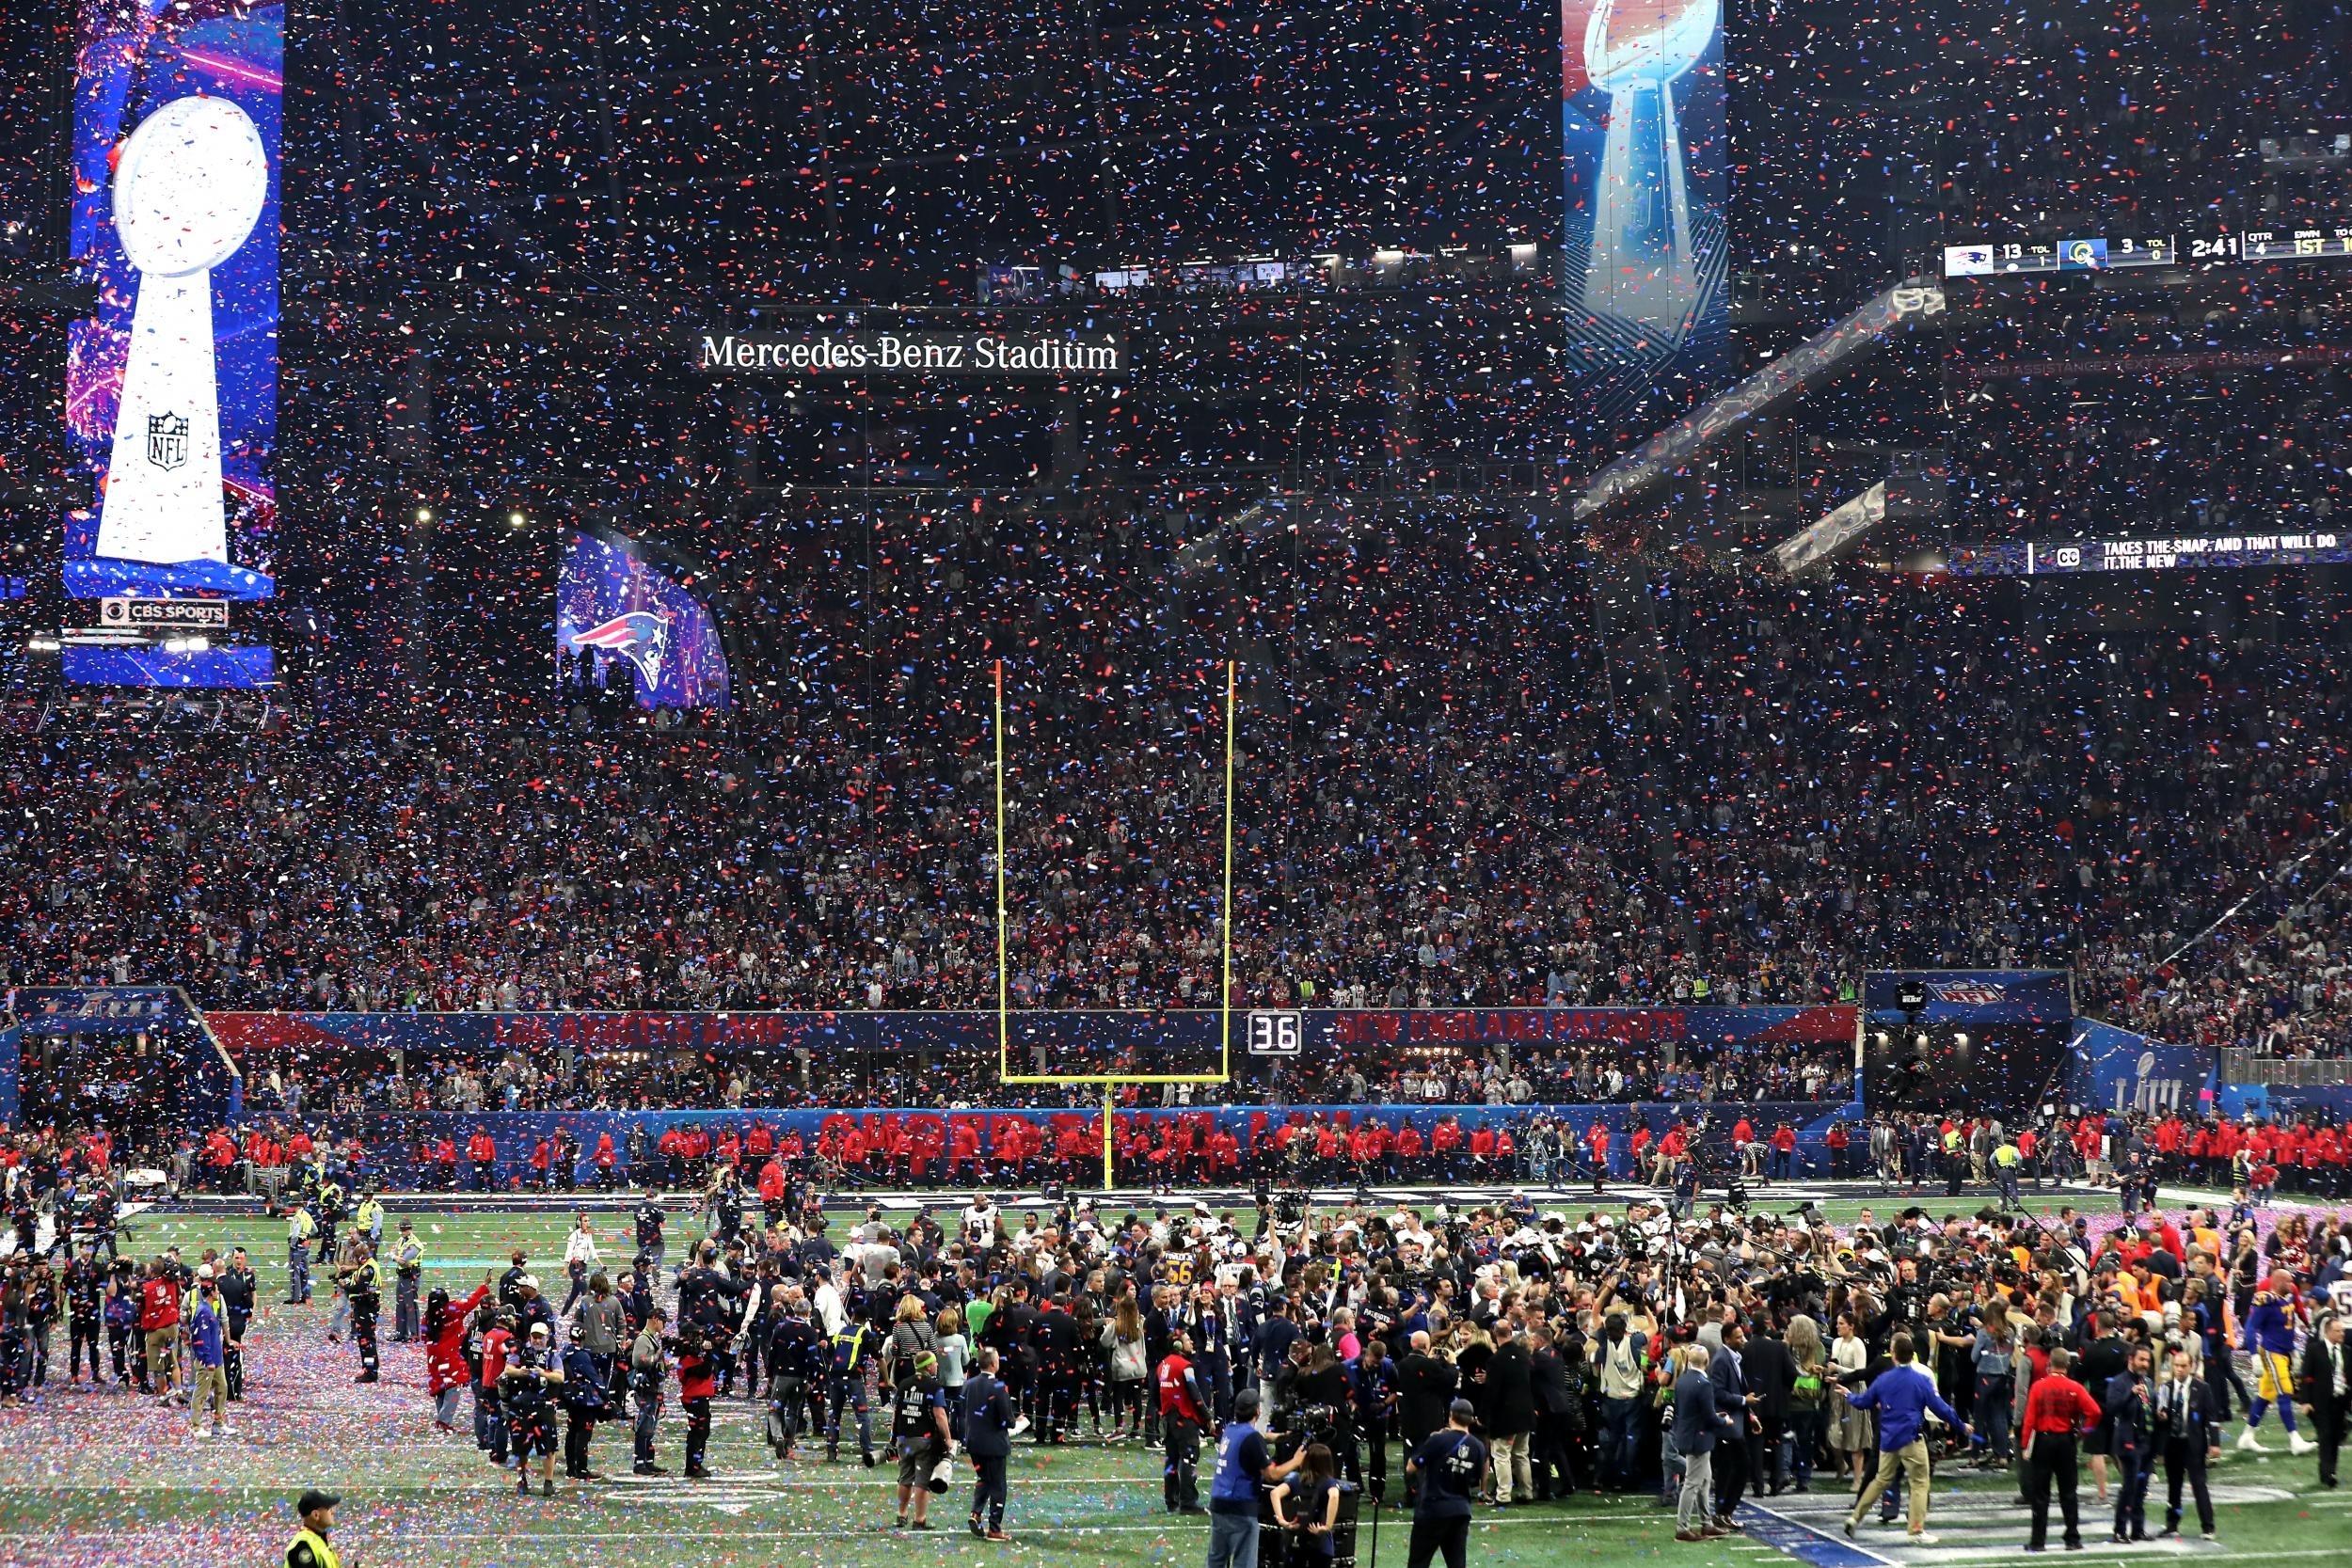 Super Bowl 2019 Attendance: La Rams Vs New England Patriots pertaining to Super Bowl 2019 Stadium Seating Capacity